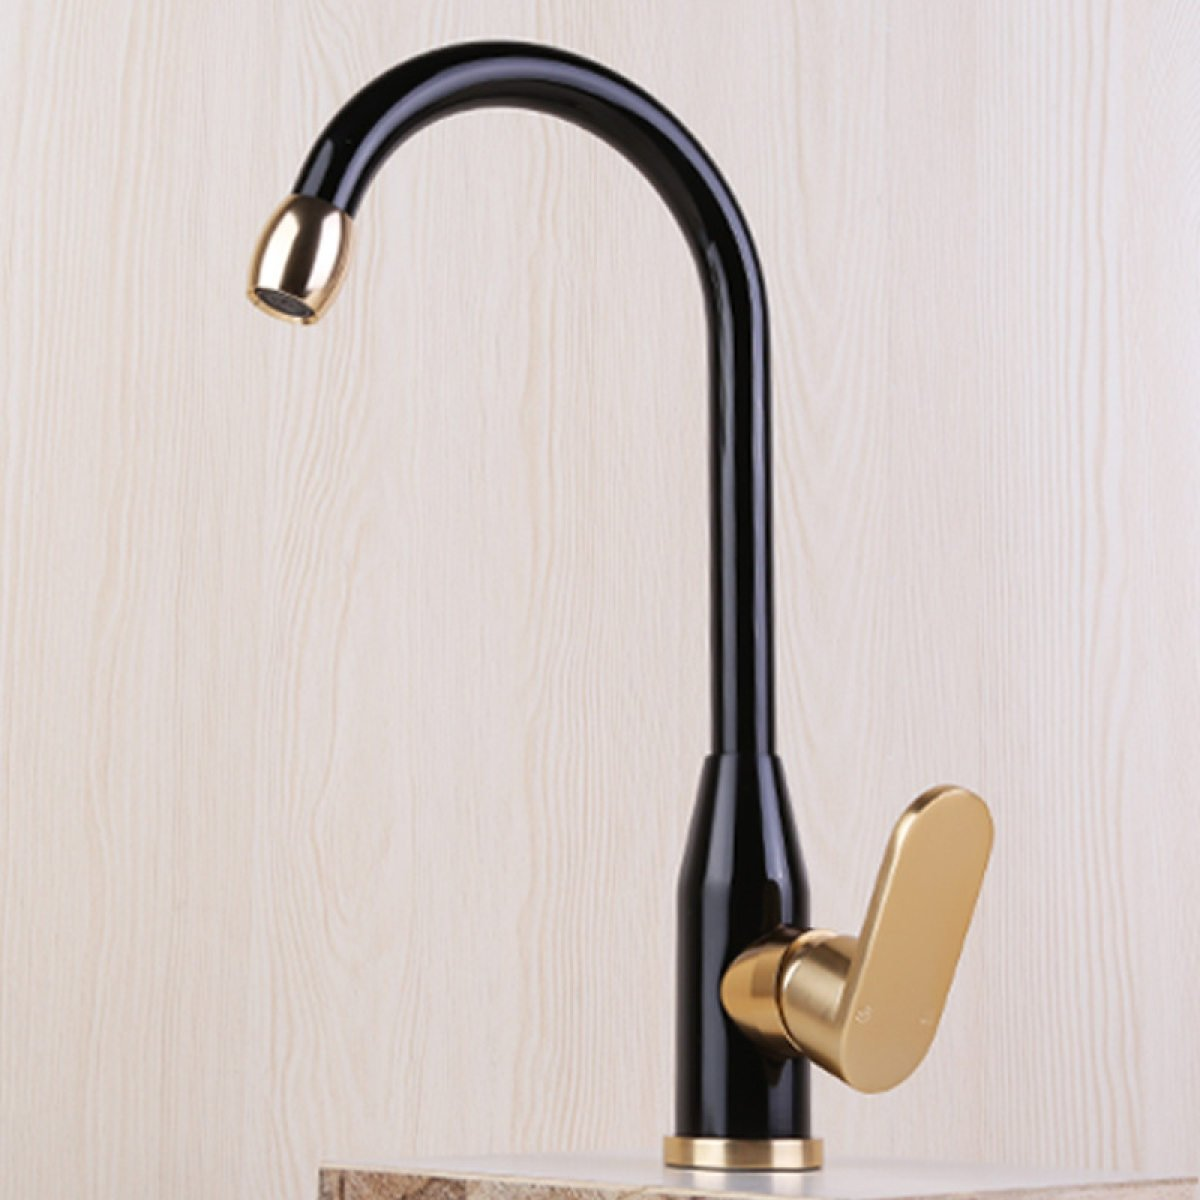 LDONGSH Space Aluminum Black Gold Pots Kitchen Drawing Electroplating Faucet Tap